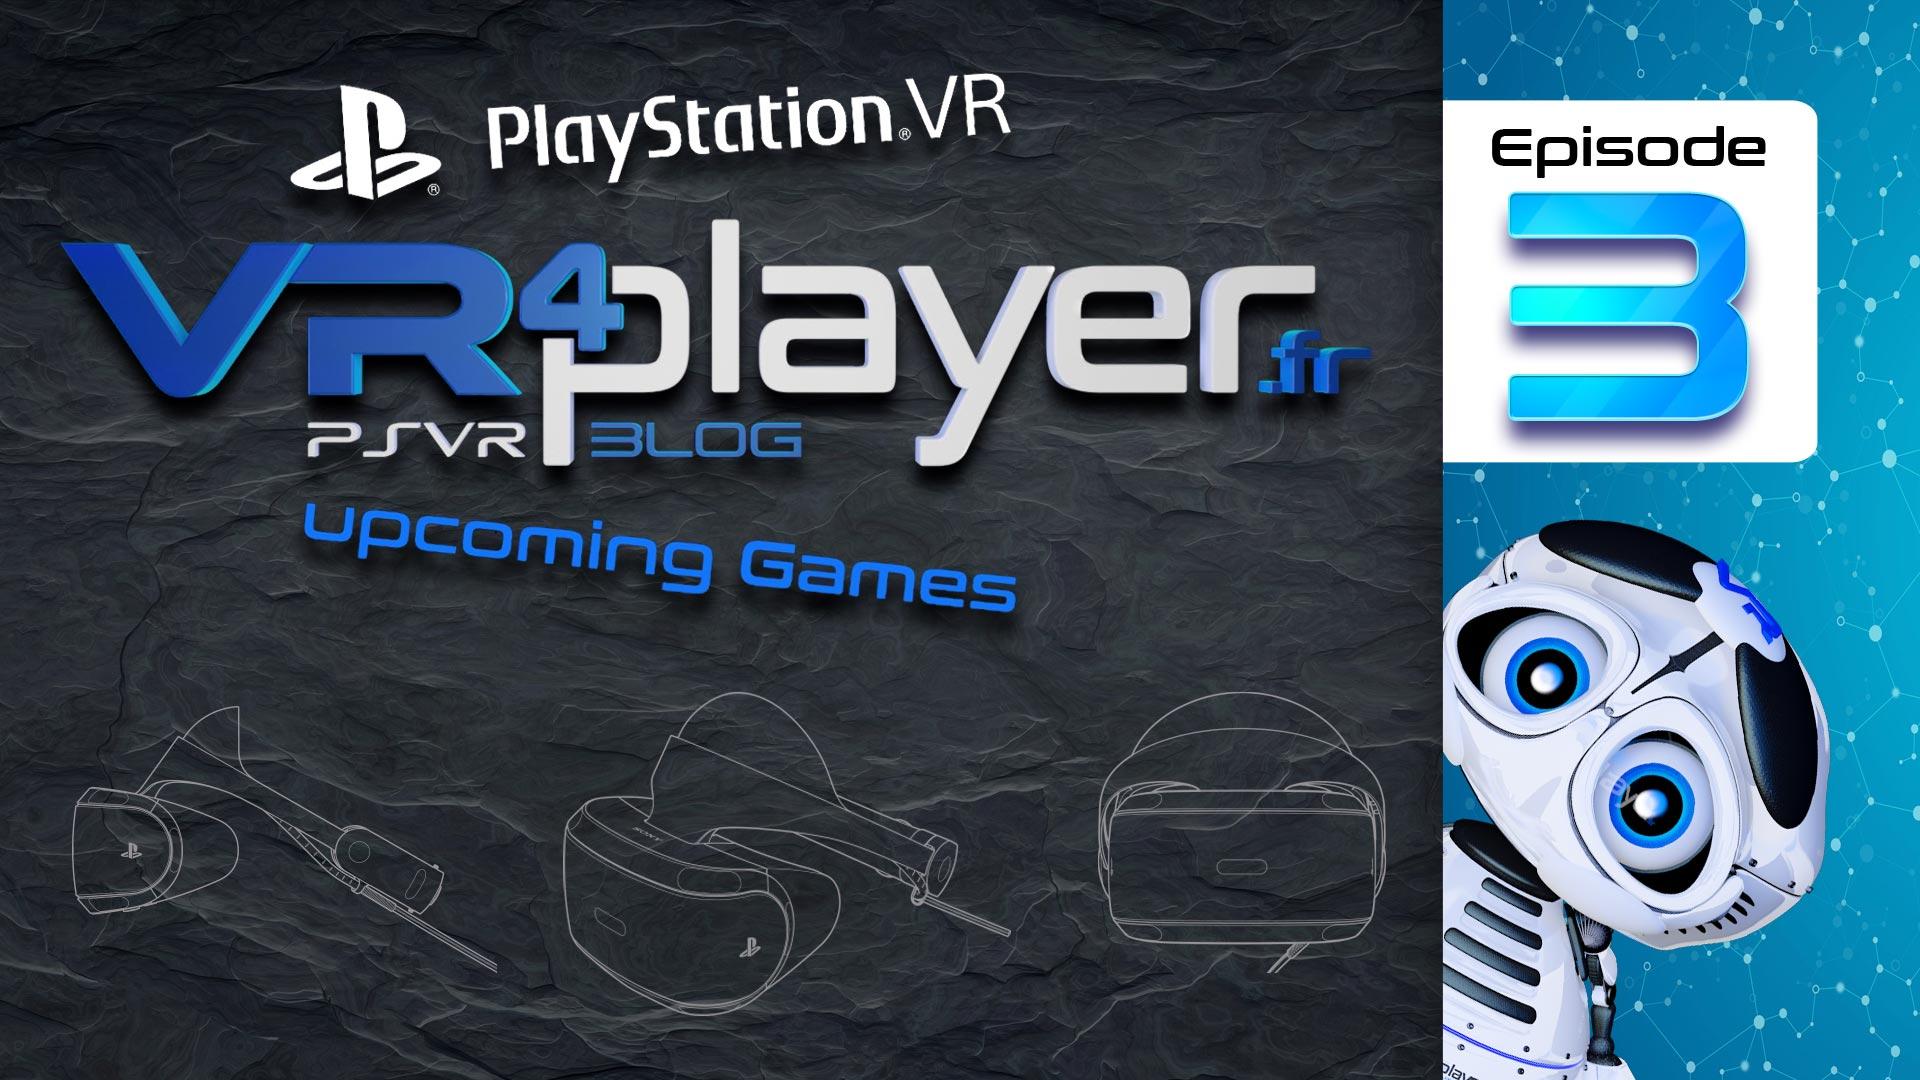 PlayStation VR upcoming games Episode 3